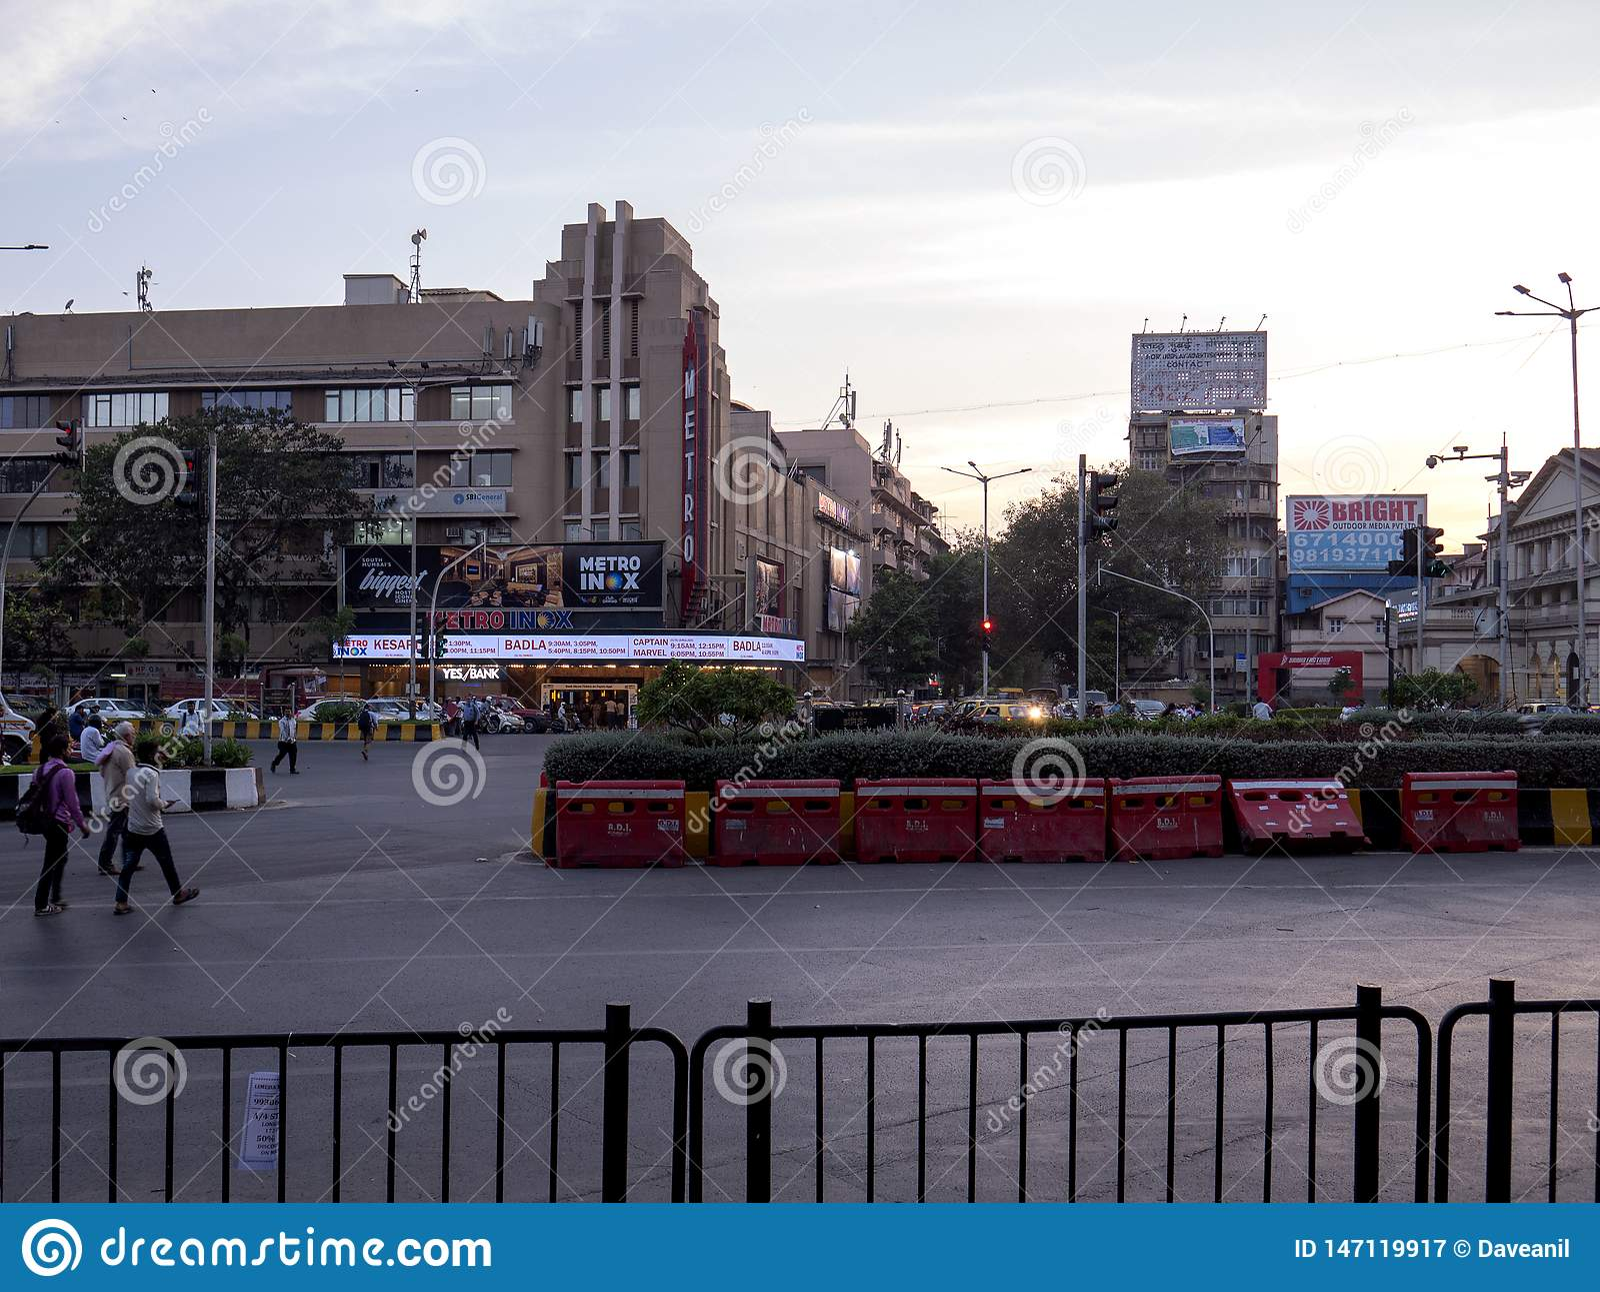 Vasudev Balwant Phadke Chowk opp aan metro Bioskoop, Dhobitalao Azad Maidan, Marine Lines